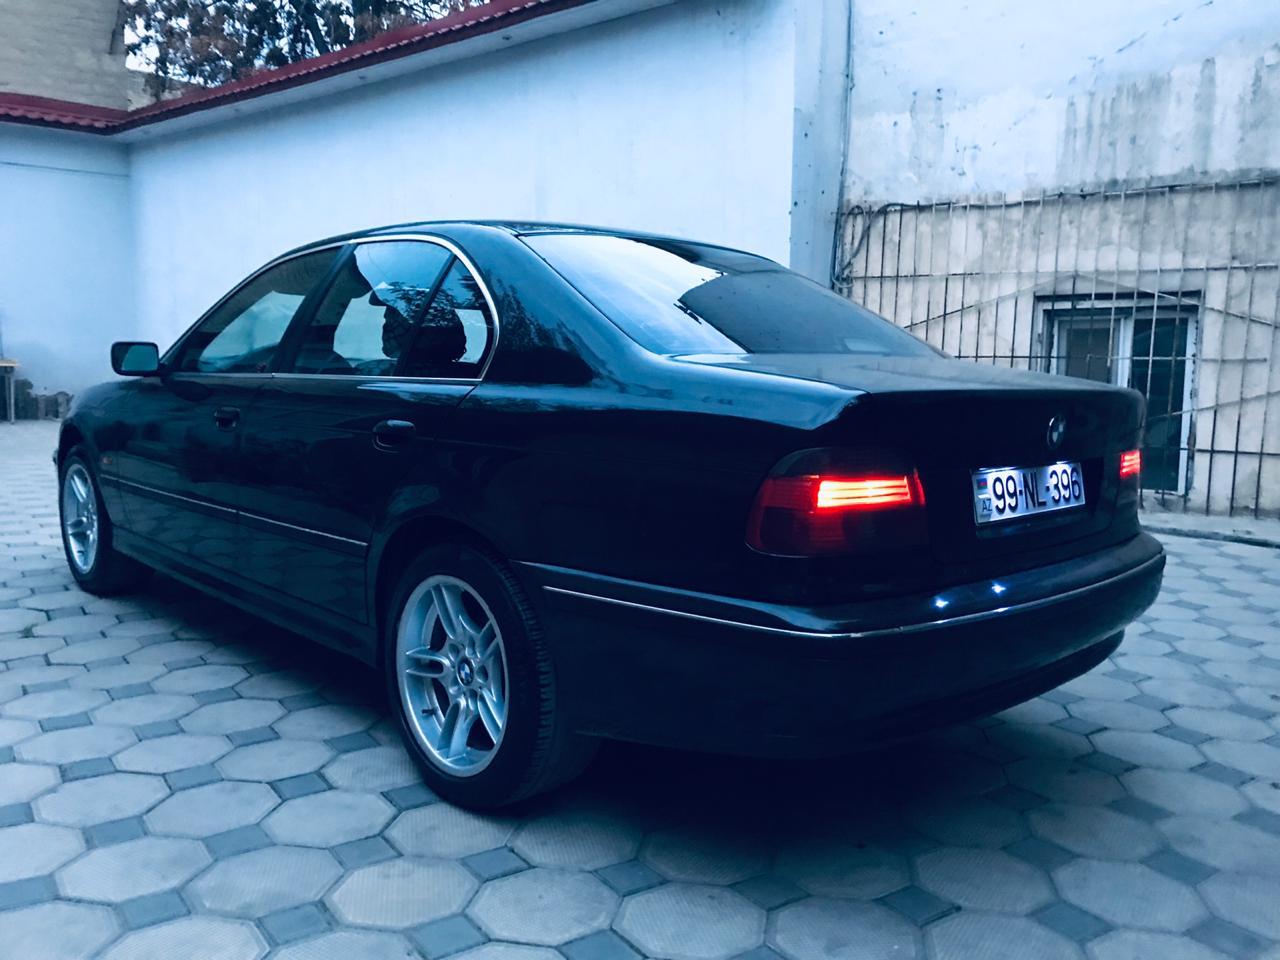 BMW 525 2.5(lt) 1996 Second hand  $4710